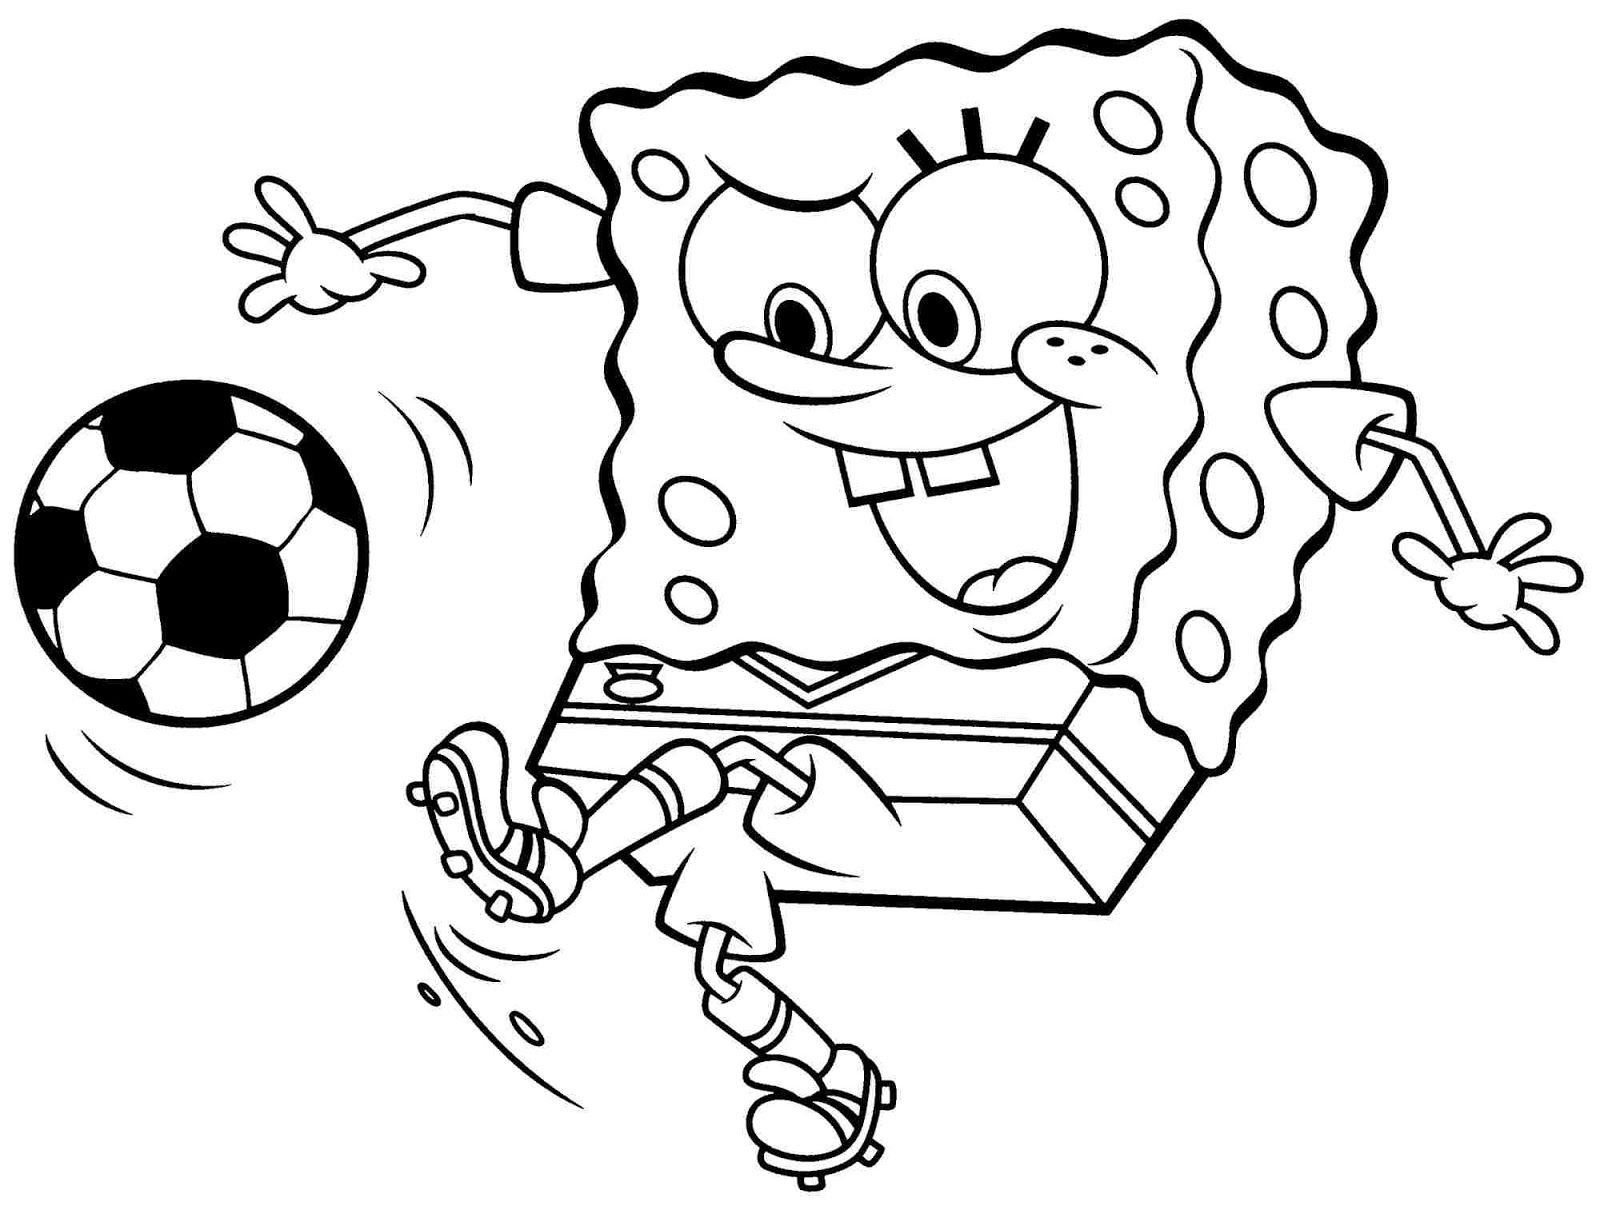 Gambar Mewarnai Spongebob